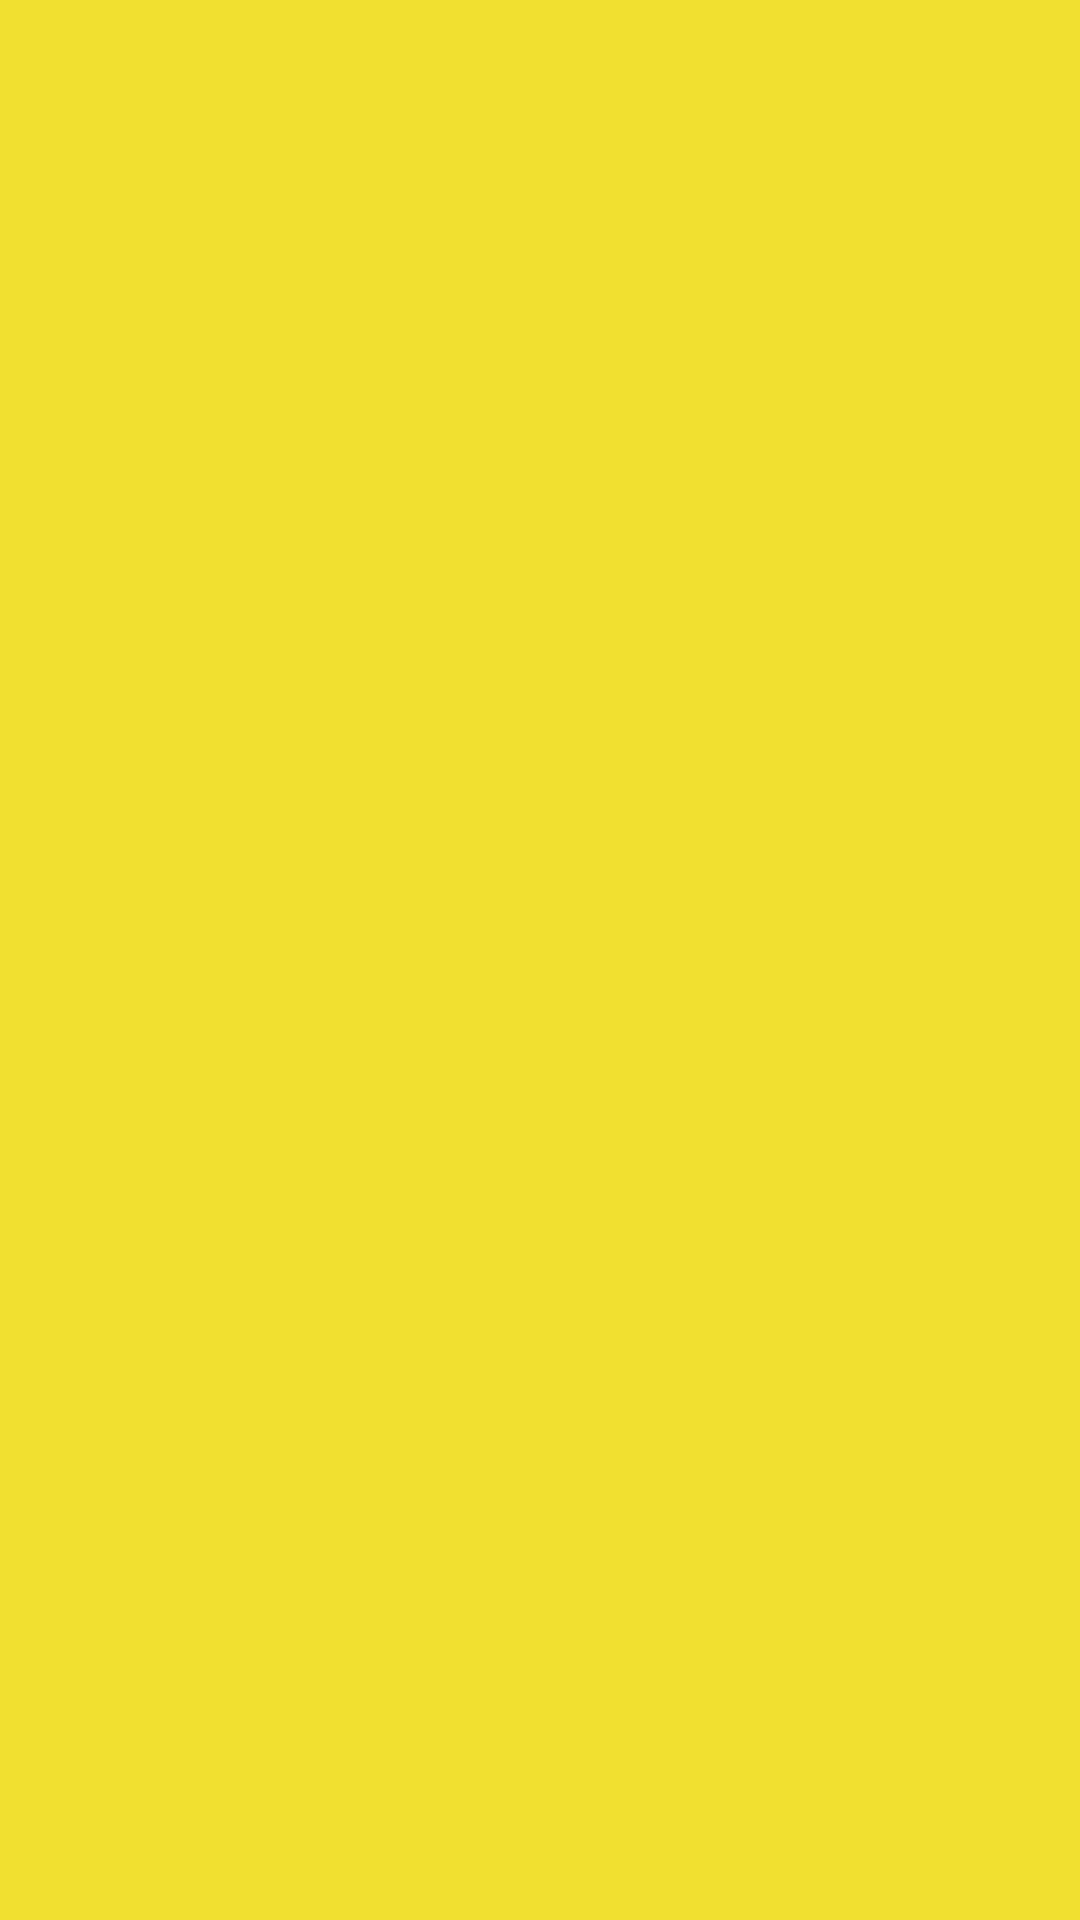 1080x1920 Dandelion Solid Color Background